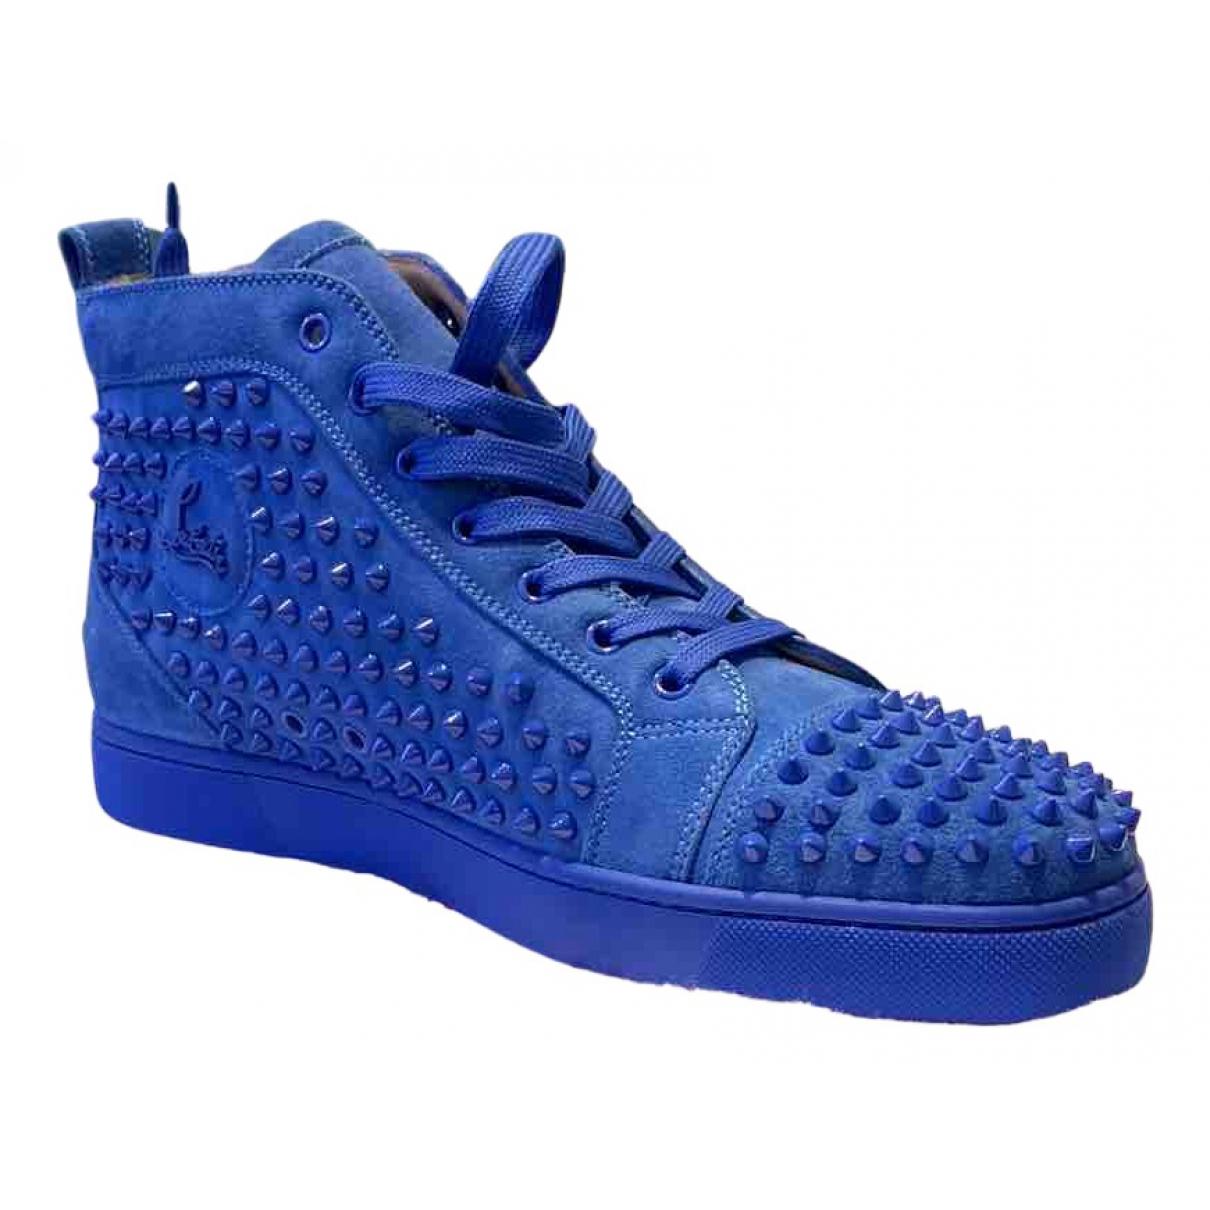 Christian Louboutin Louis Sneakers in  Blau Veloursleder